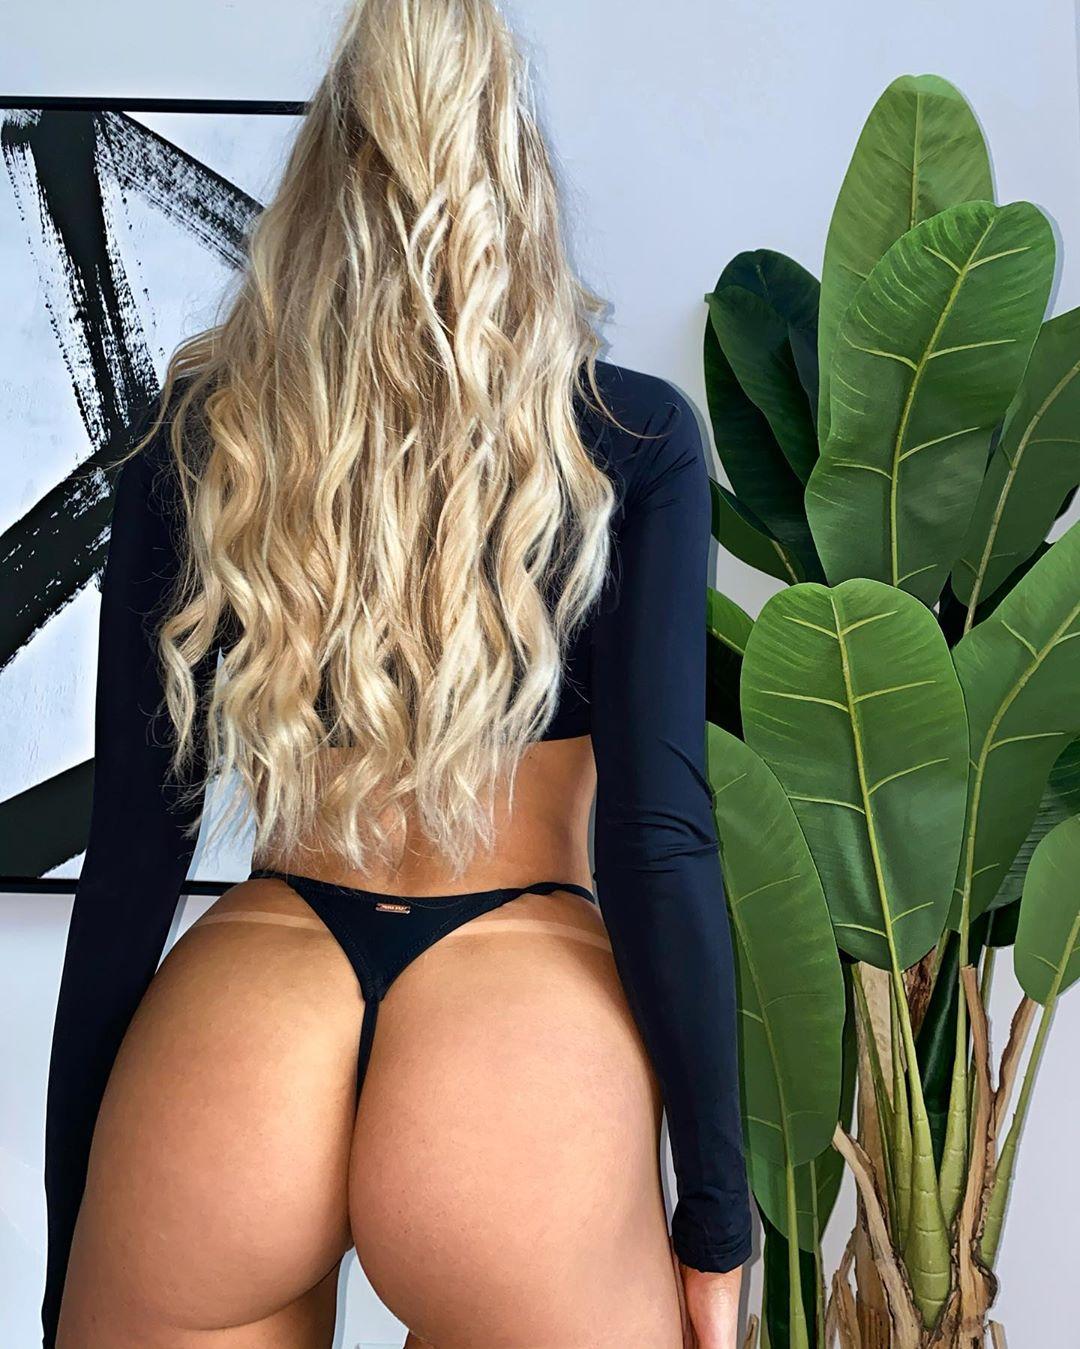 Lauren Dascalo Nude & Sex Tape Onlyfans Leaked 0003